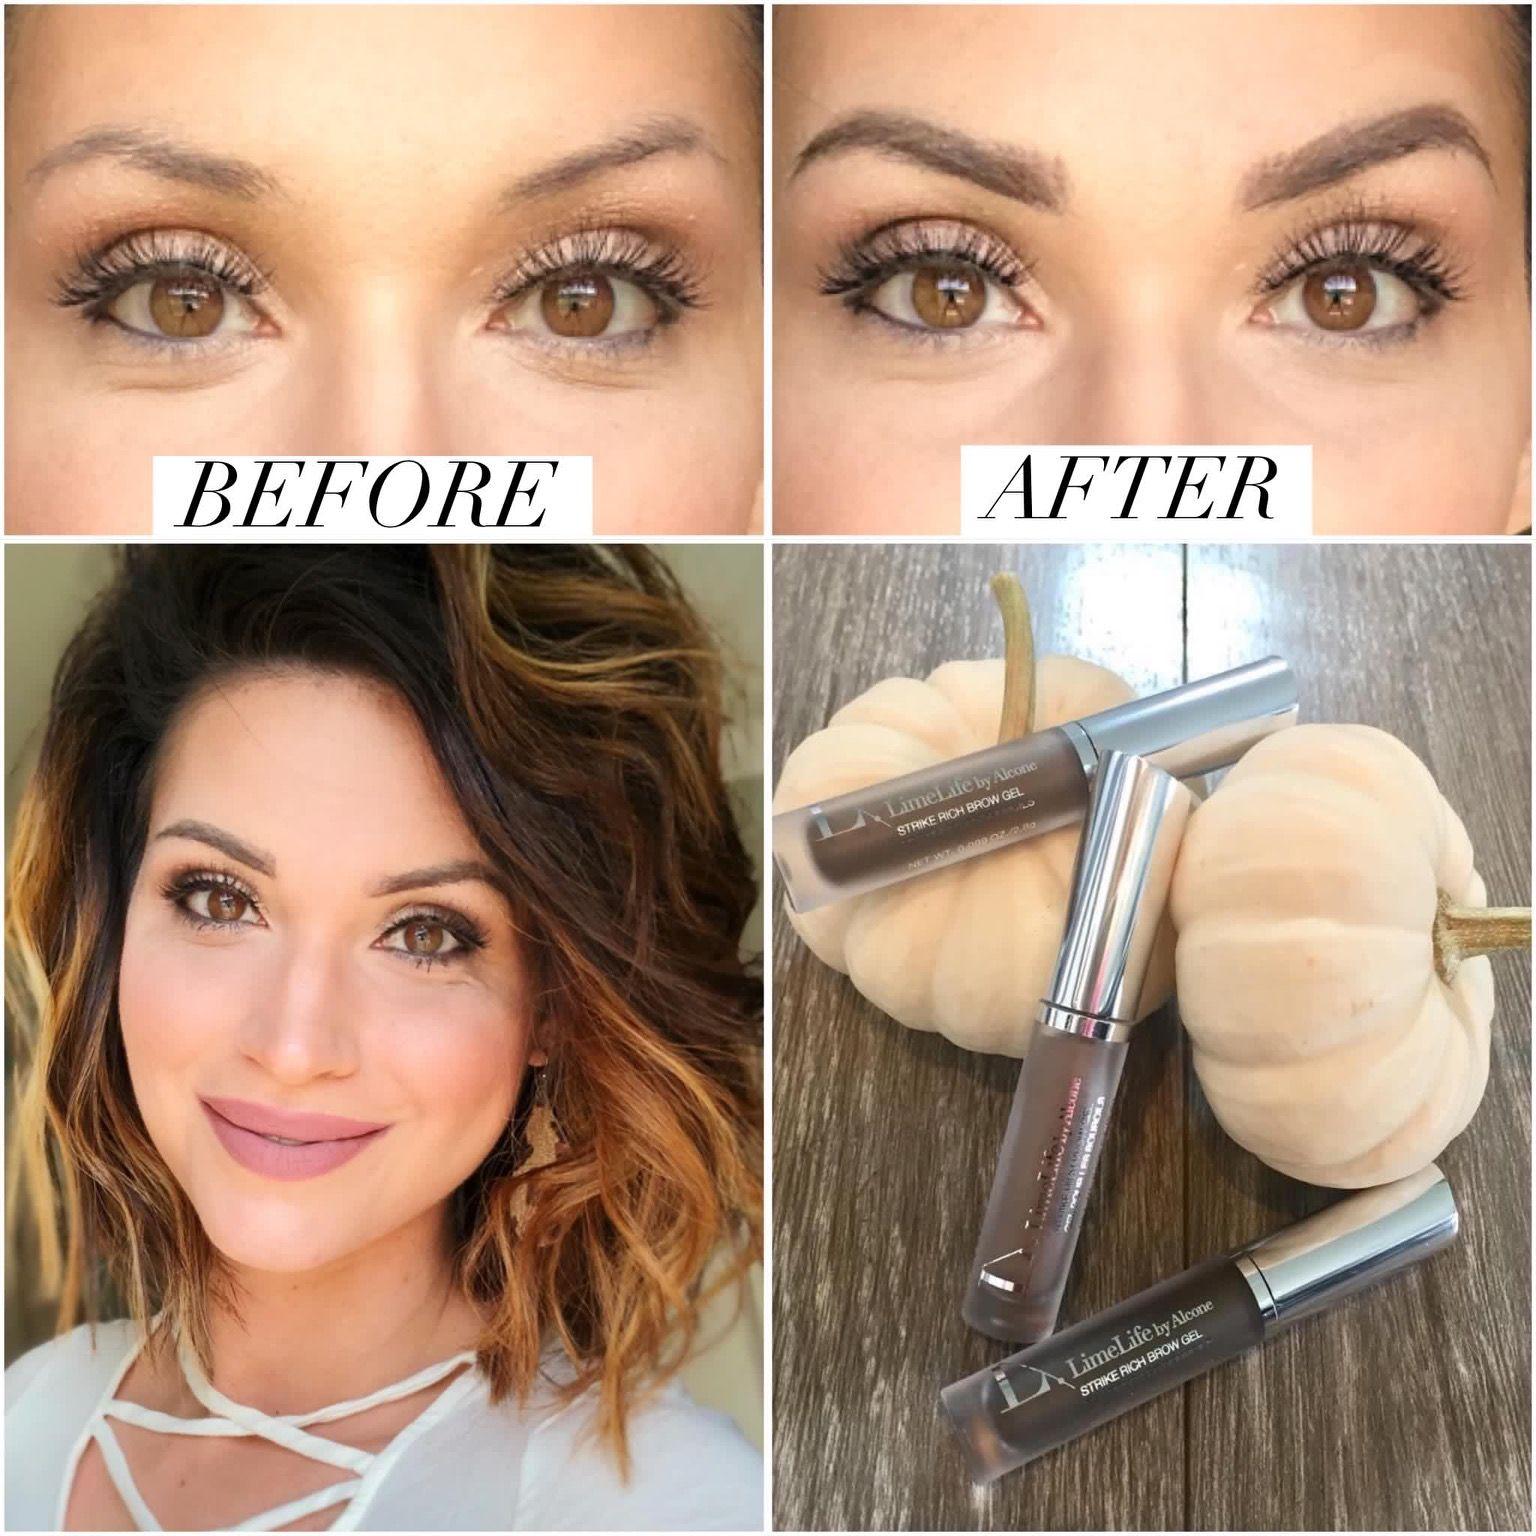 b9b0fe08d13 Pin by Meagan Bianca on Unbelieva-Brow | Brow gel, Brows, Eyebrow makeup